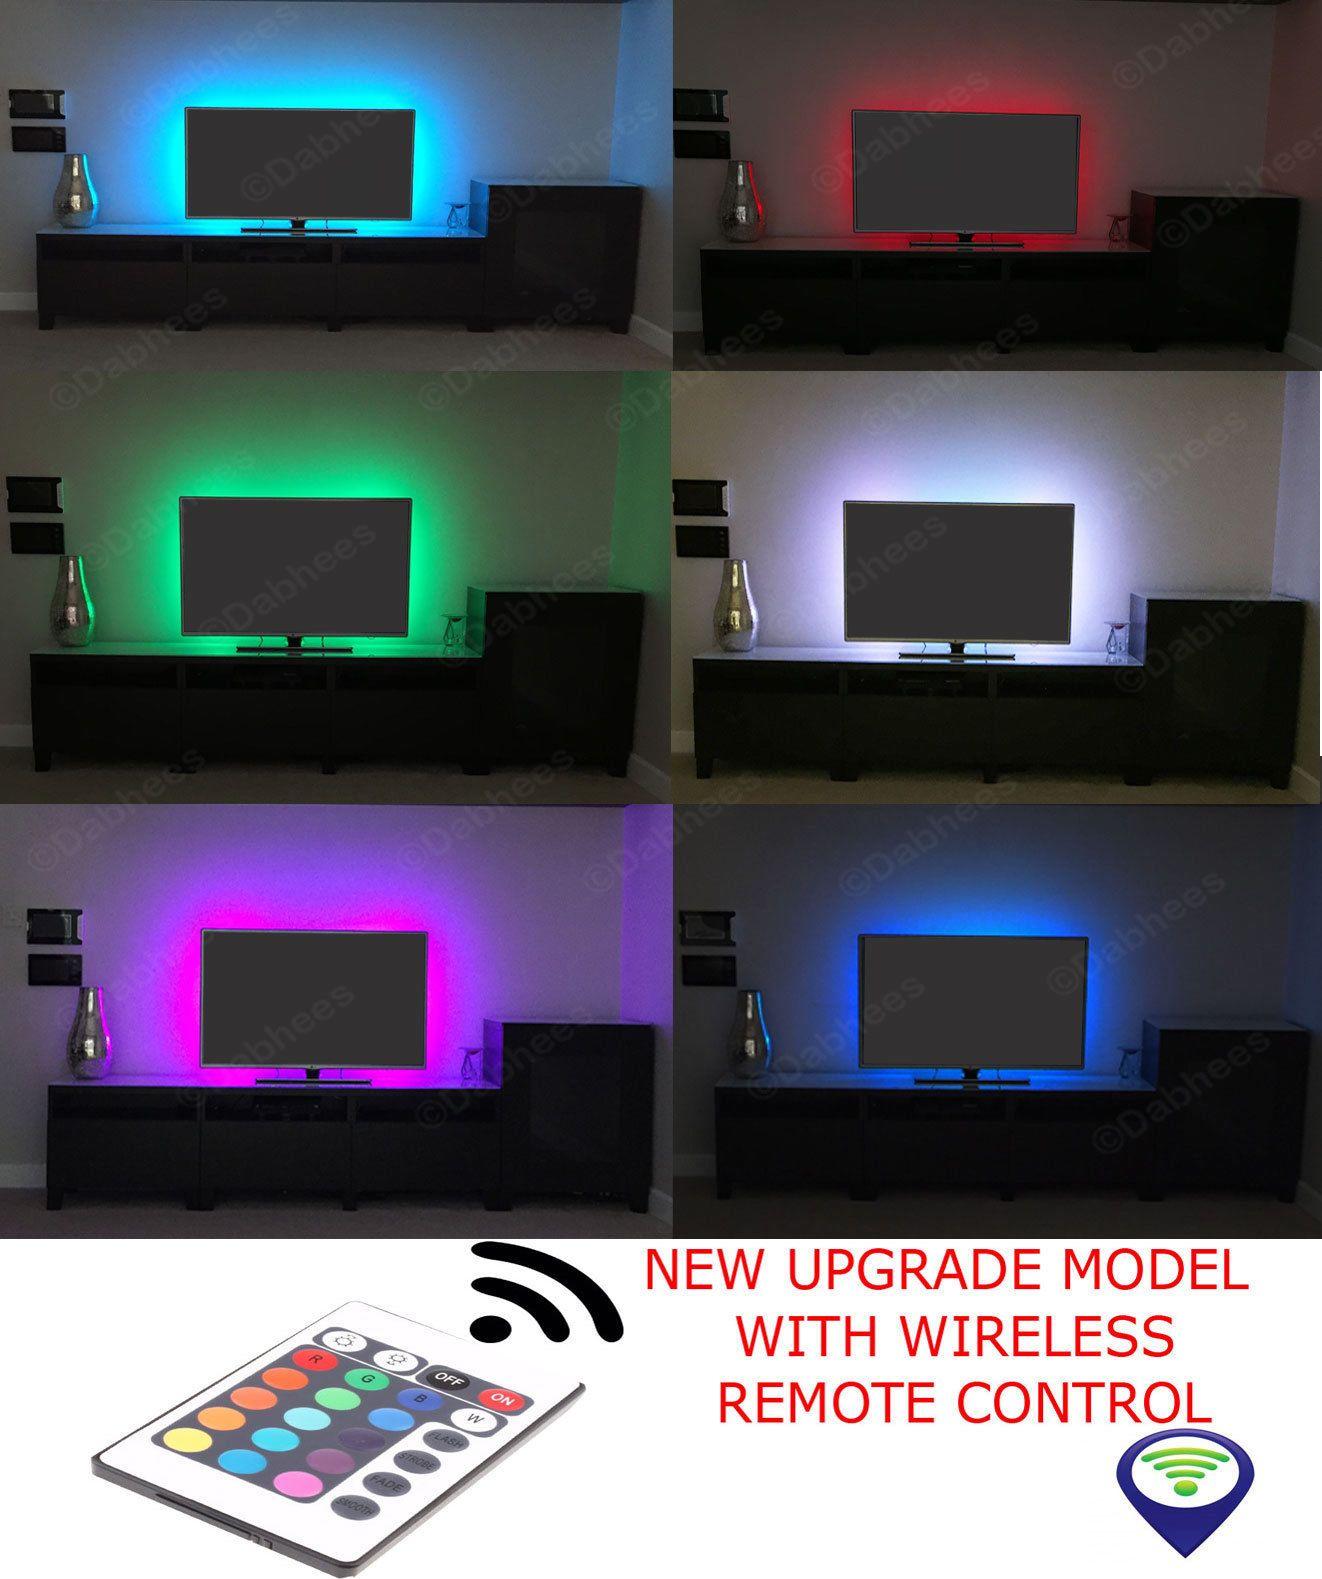 Dabhees Led Light Strips eBay Home, Furniture & DIY in